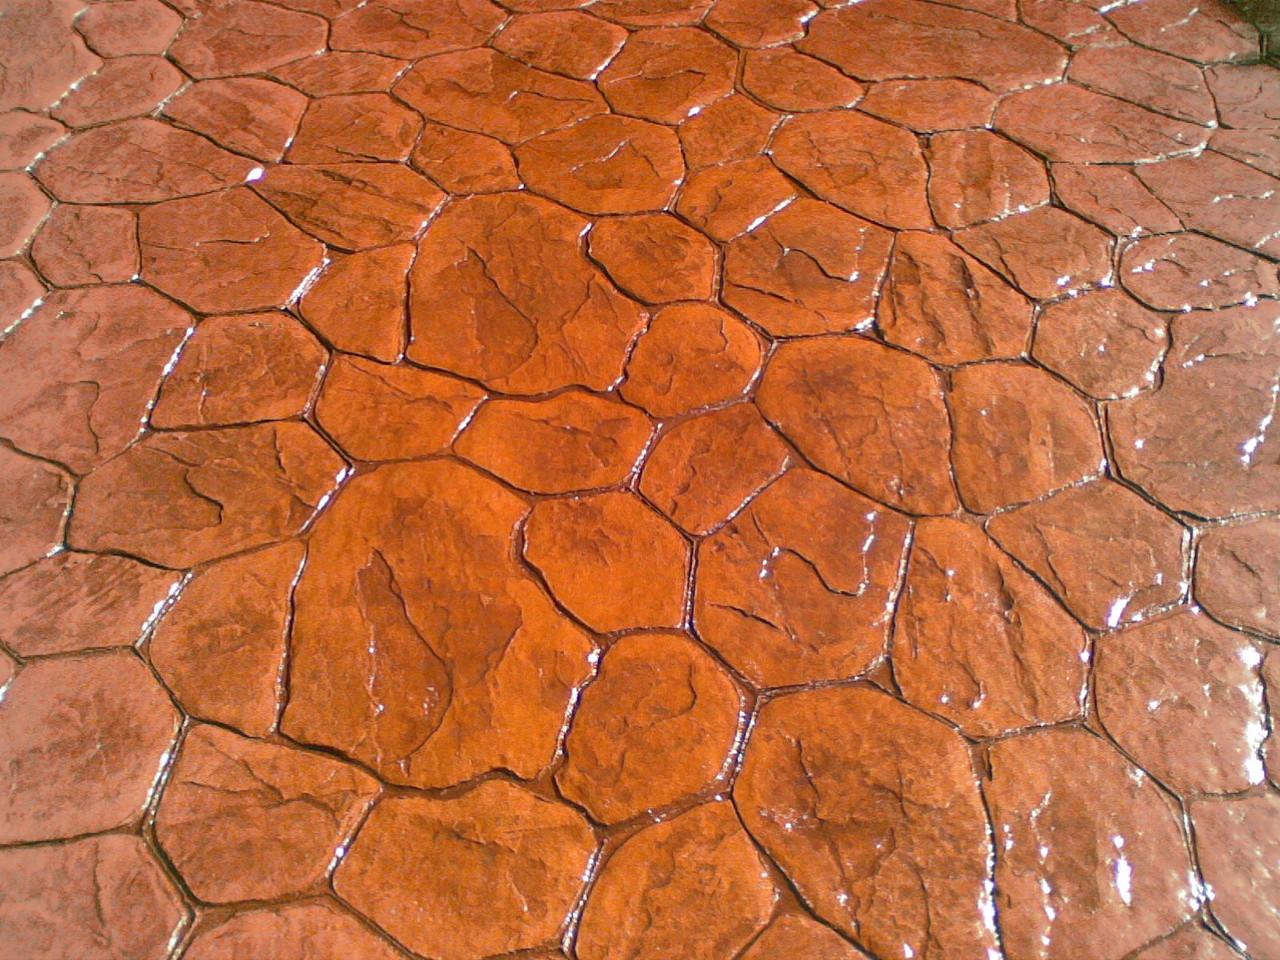 Mapa del sitio pavimentos de hormigon impreso salamanca - Hormigon impreso avila ...